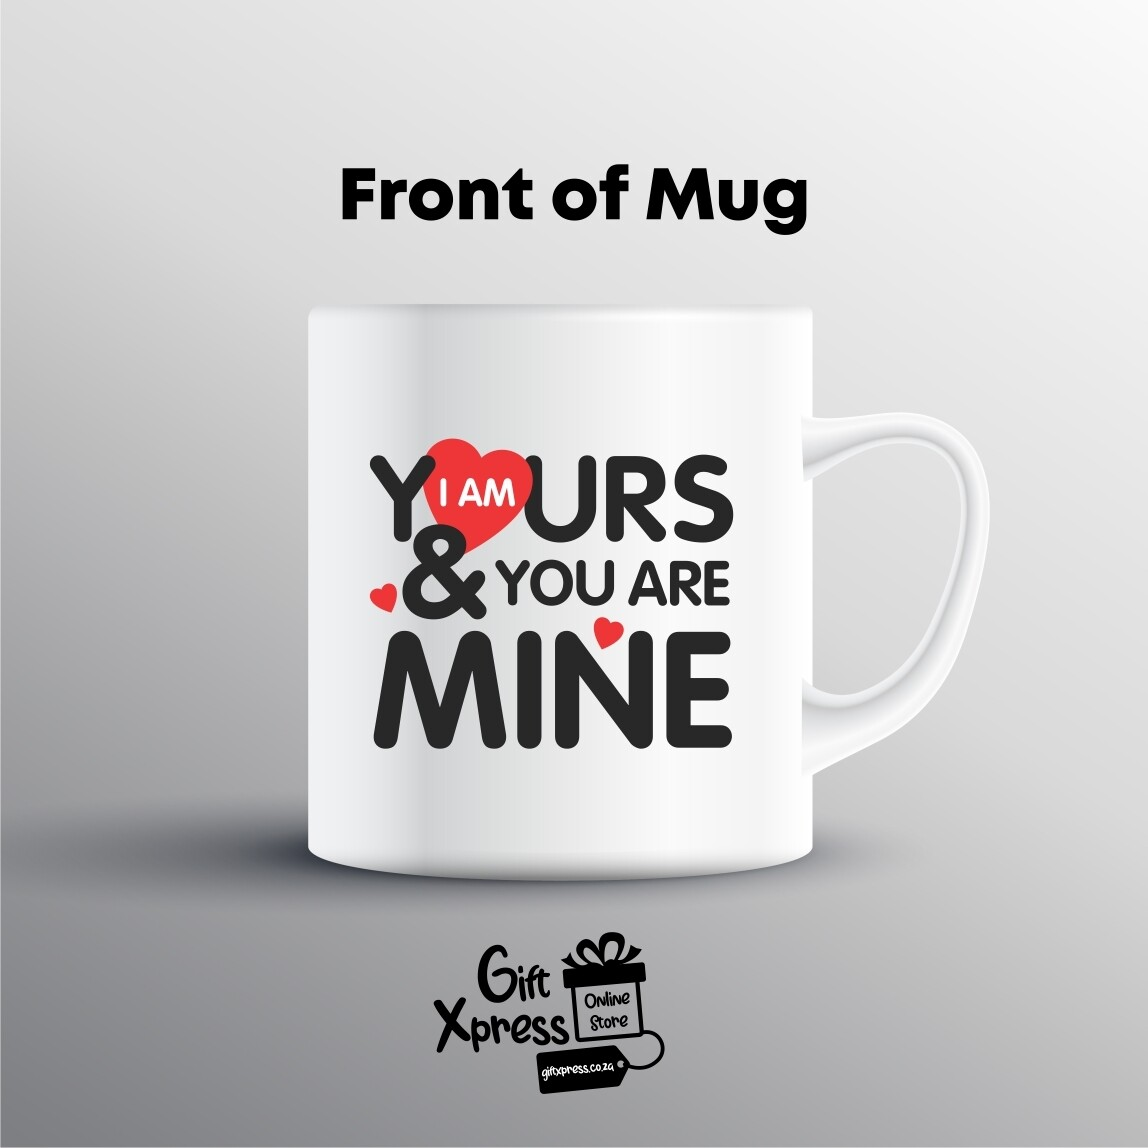 CUSTOMIZED 'I AM YOURS AND YOU ARE MINE' MUG